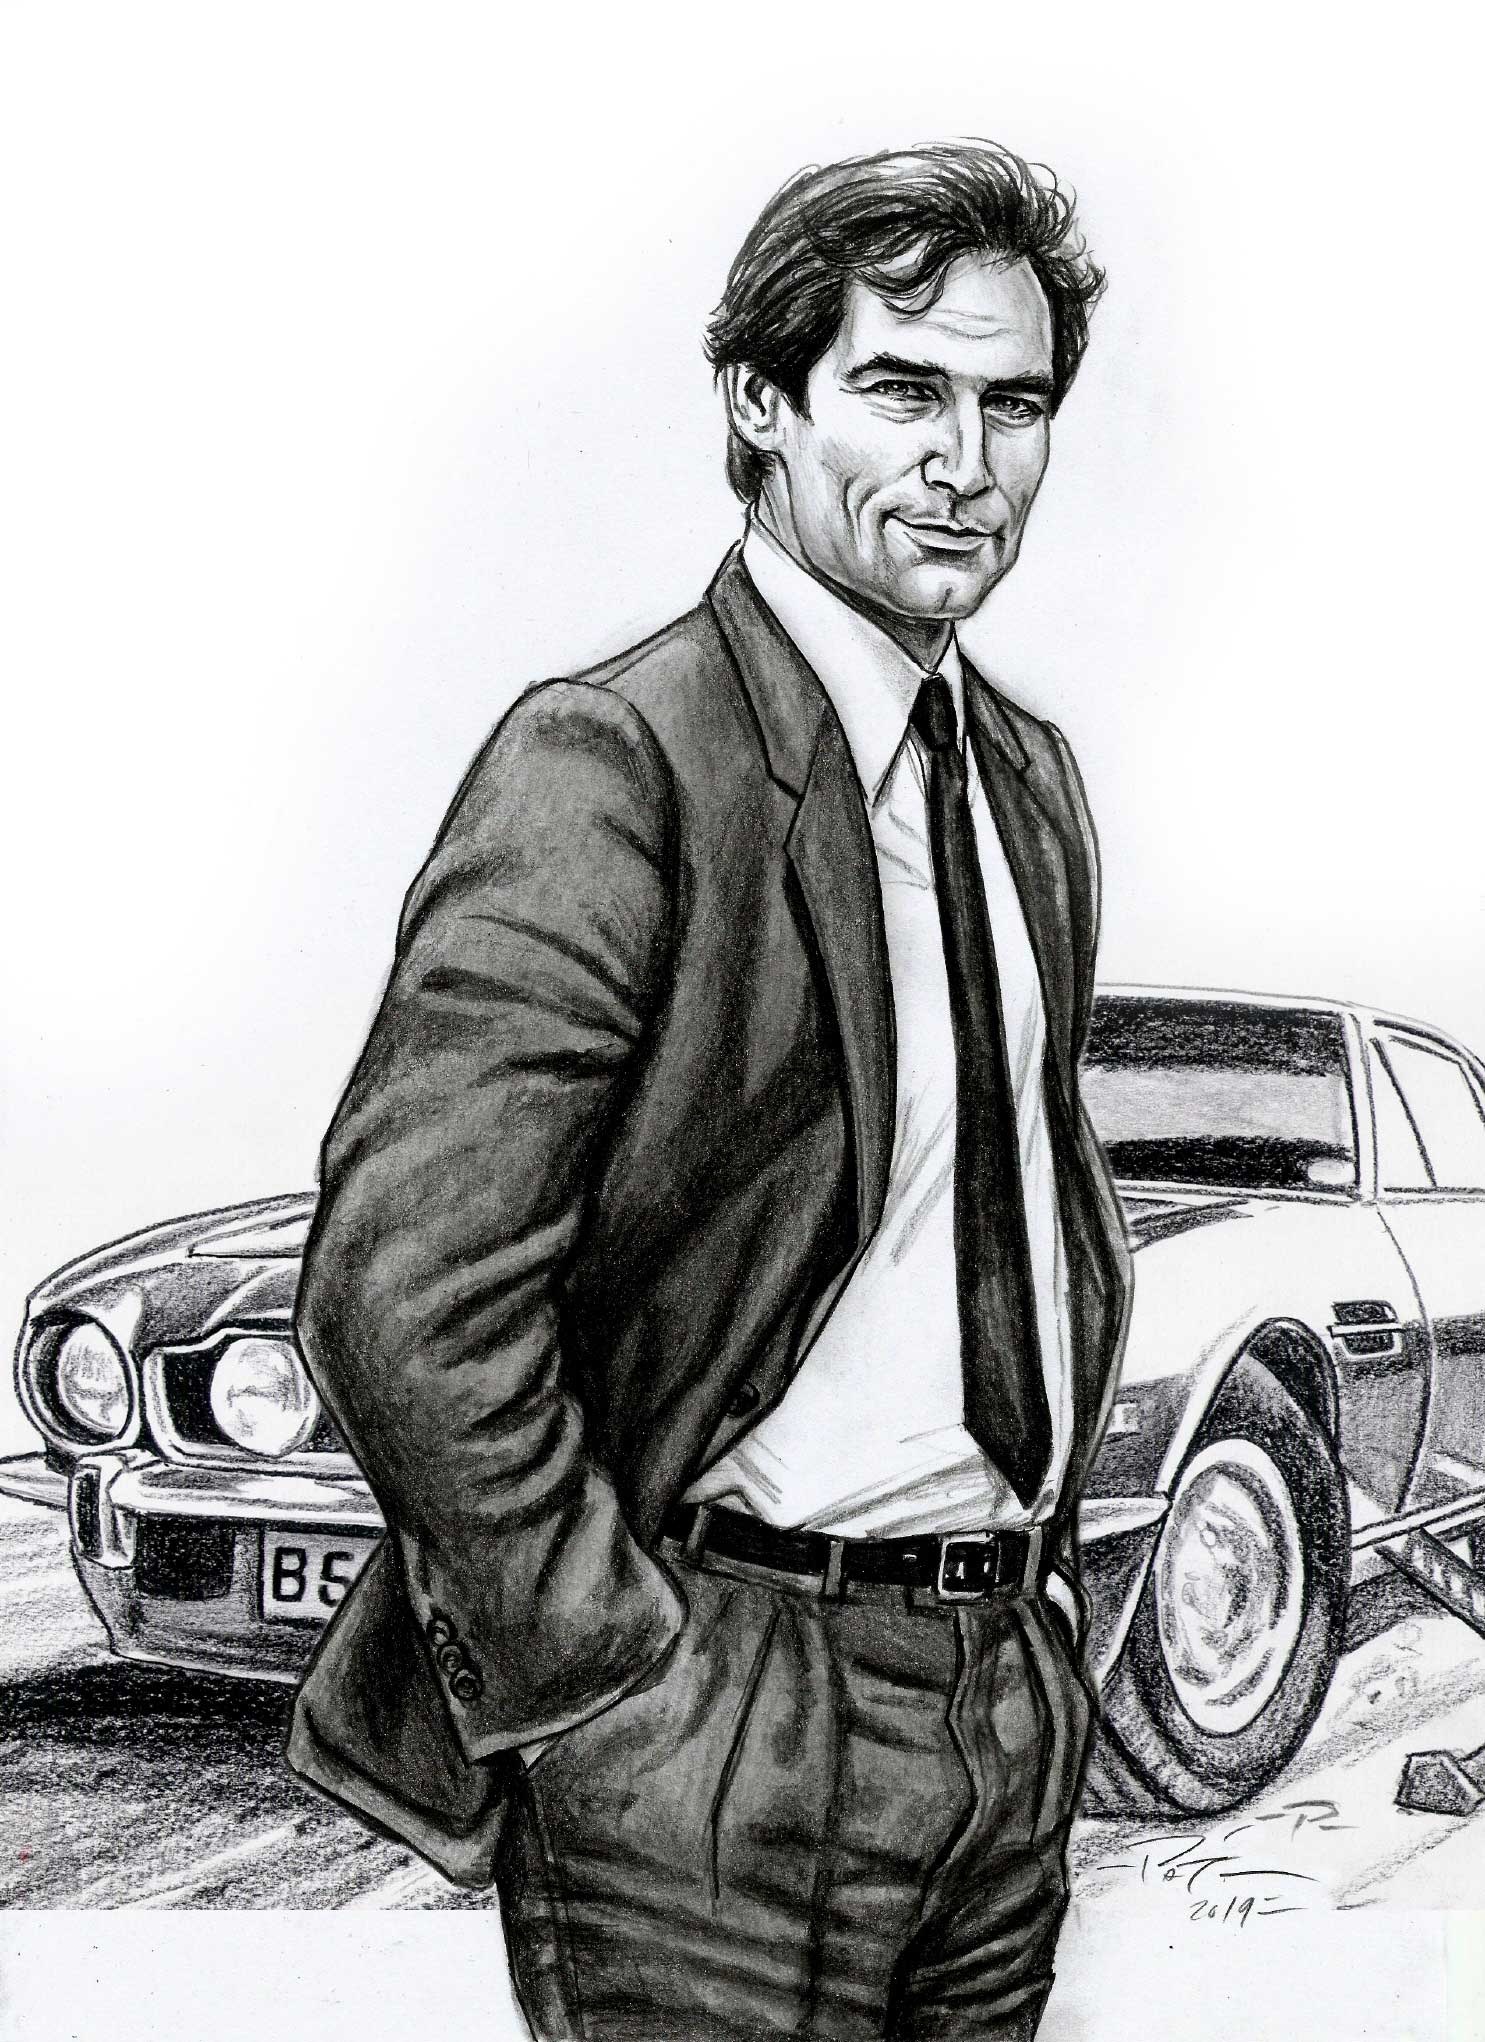 timothy dalton James Bond illustrations